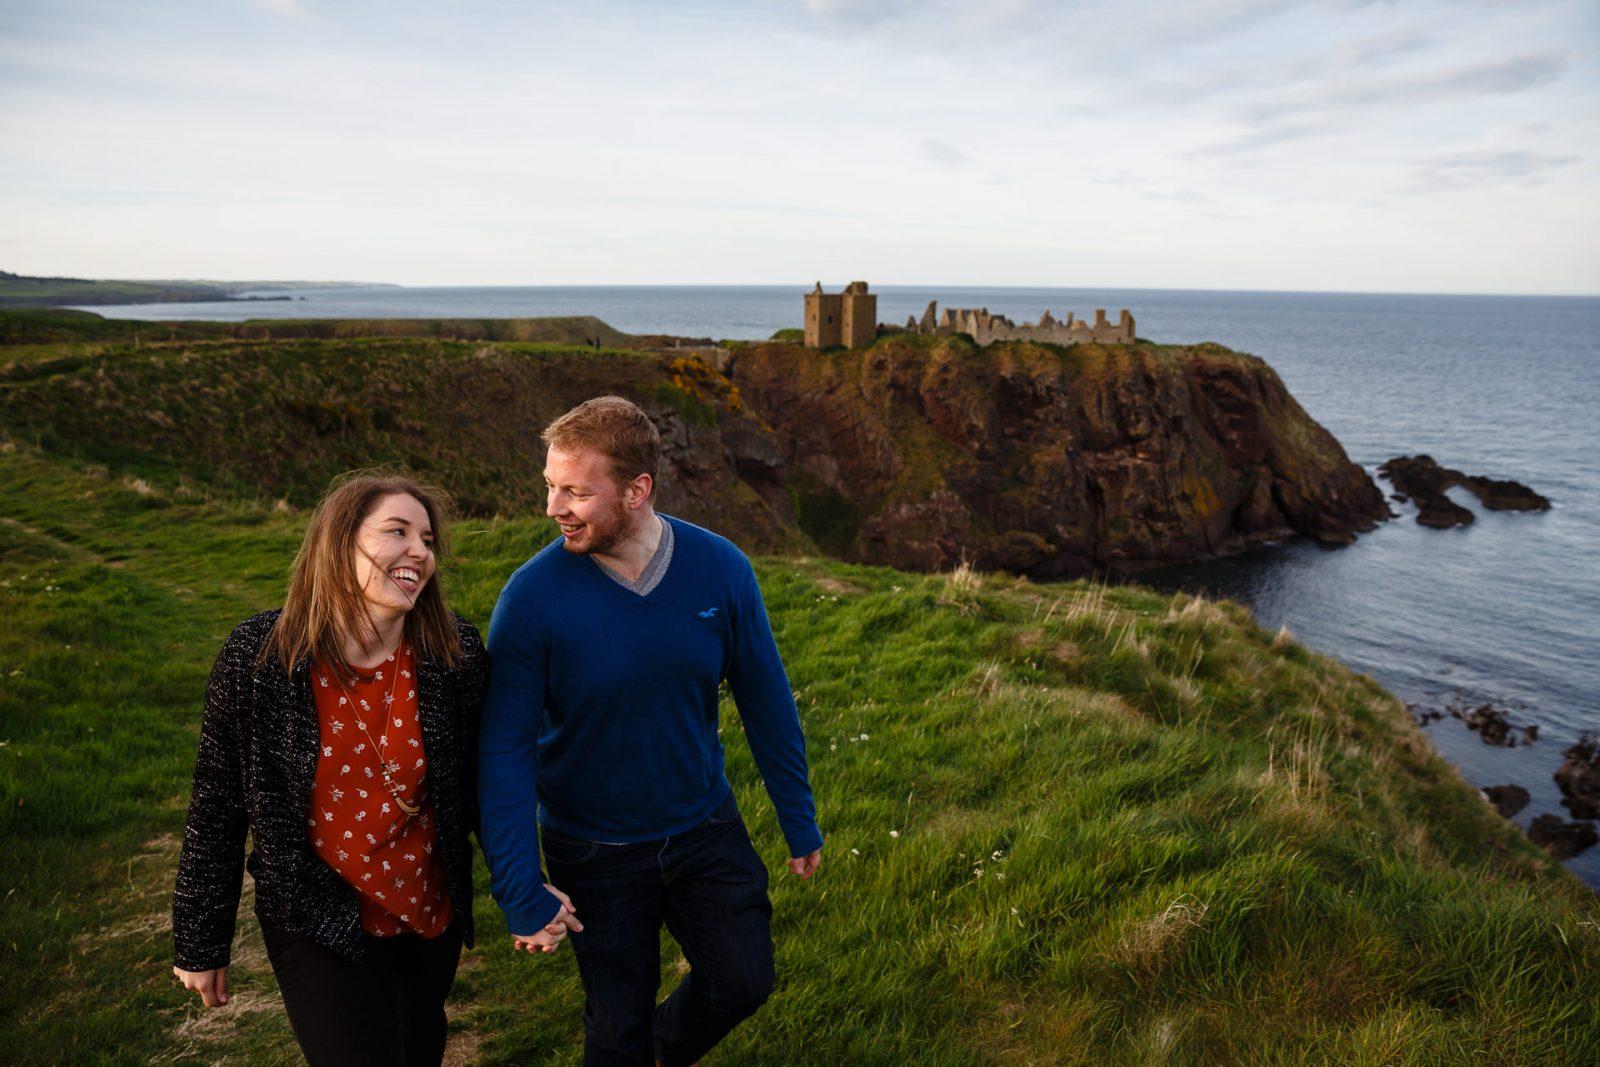 Wedding photographer Dundee Forfar Forfar Angus relaxed fun documentary natural preshoot Dunnoter Castle Aberdeen